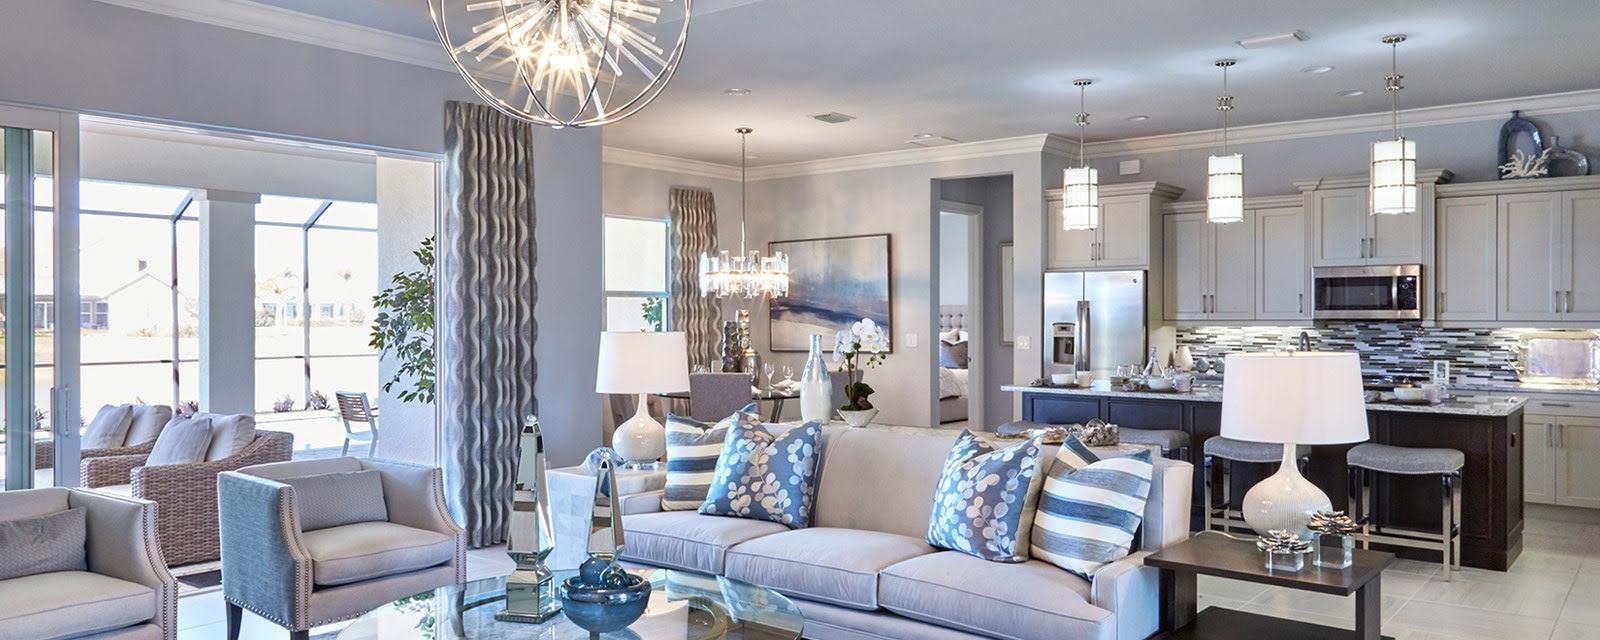 Why Shop Fine Furnishings Interior Design White Glove Delivery